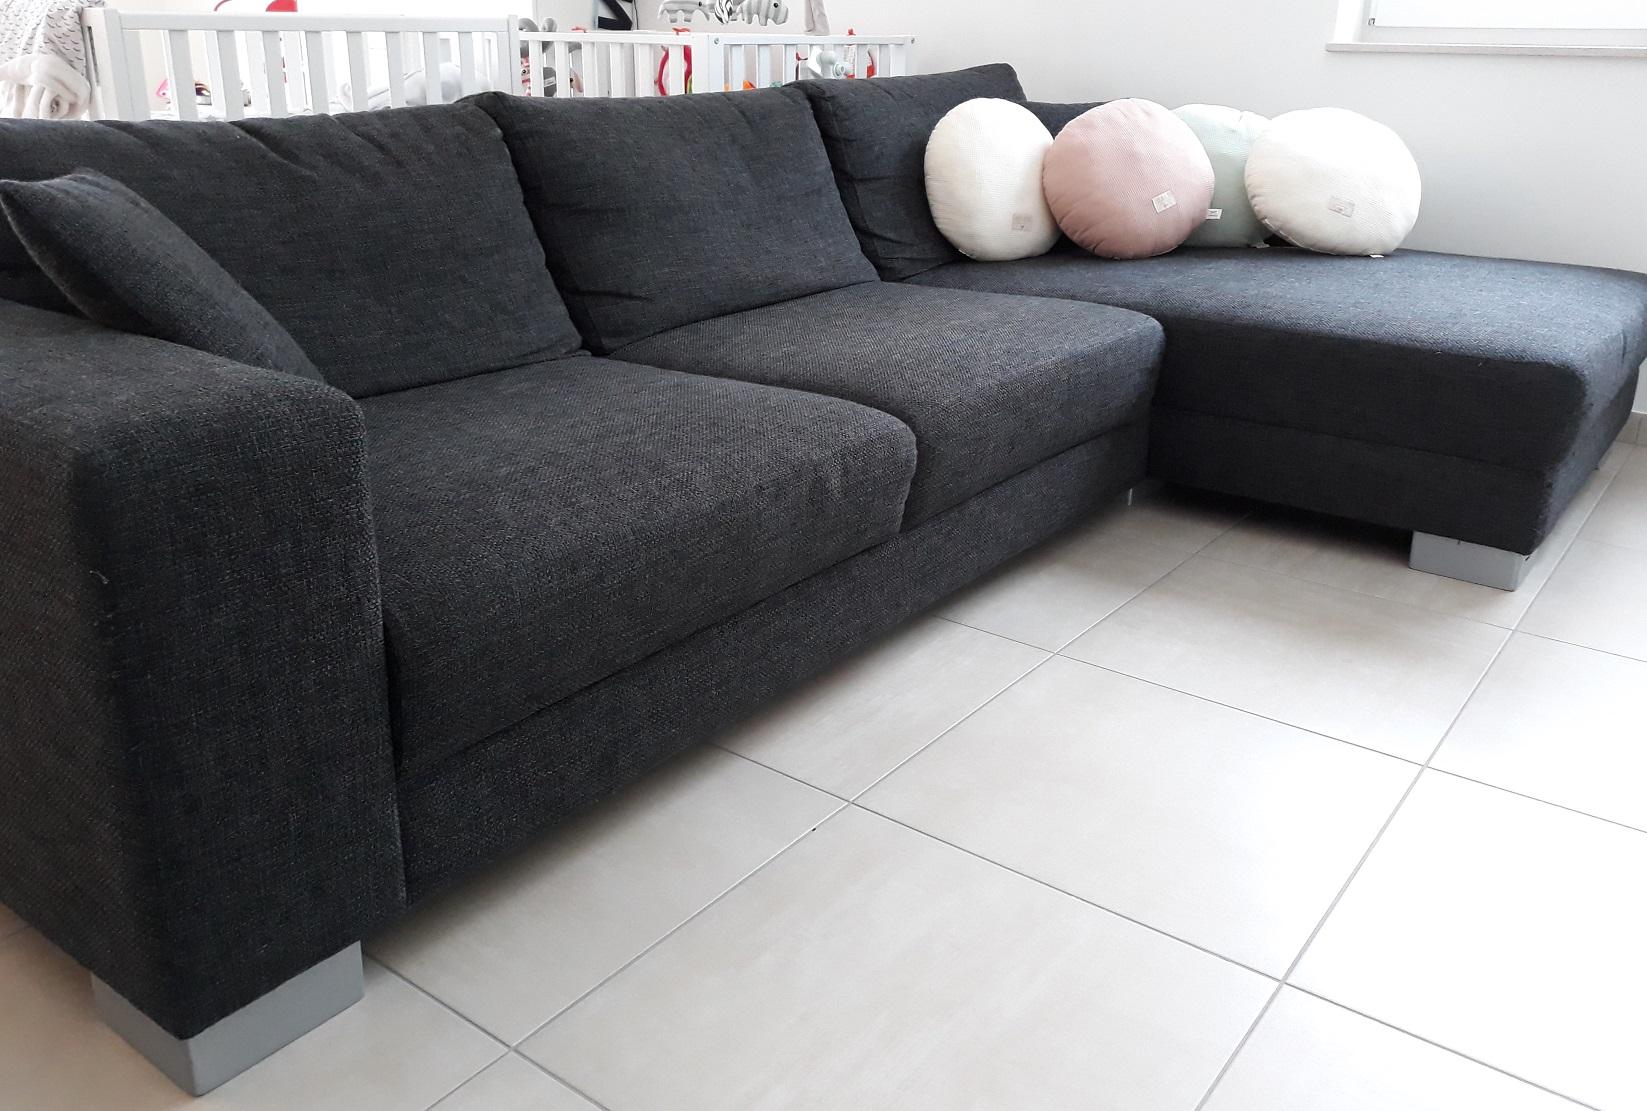 Sofa Noir Chaise Longue 3c Candy Bazar Lu